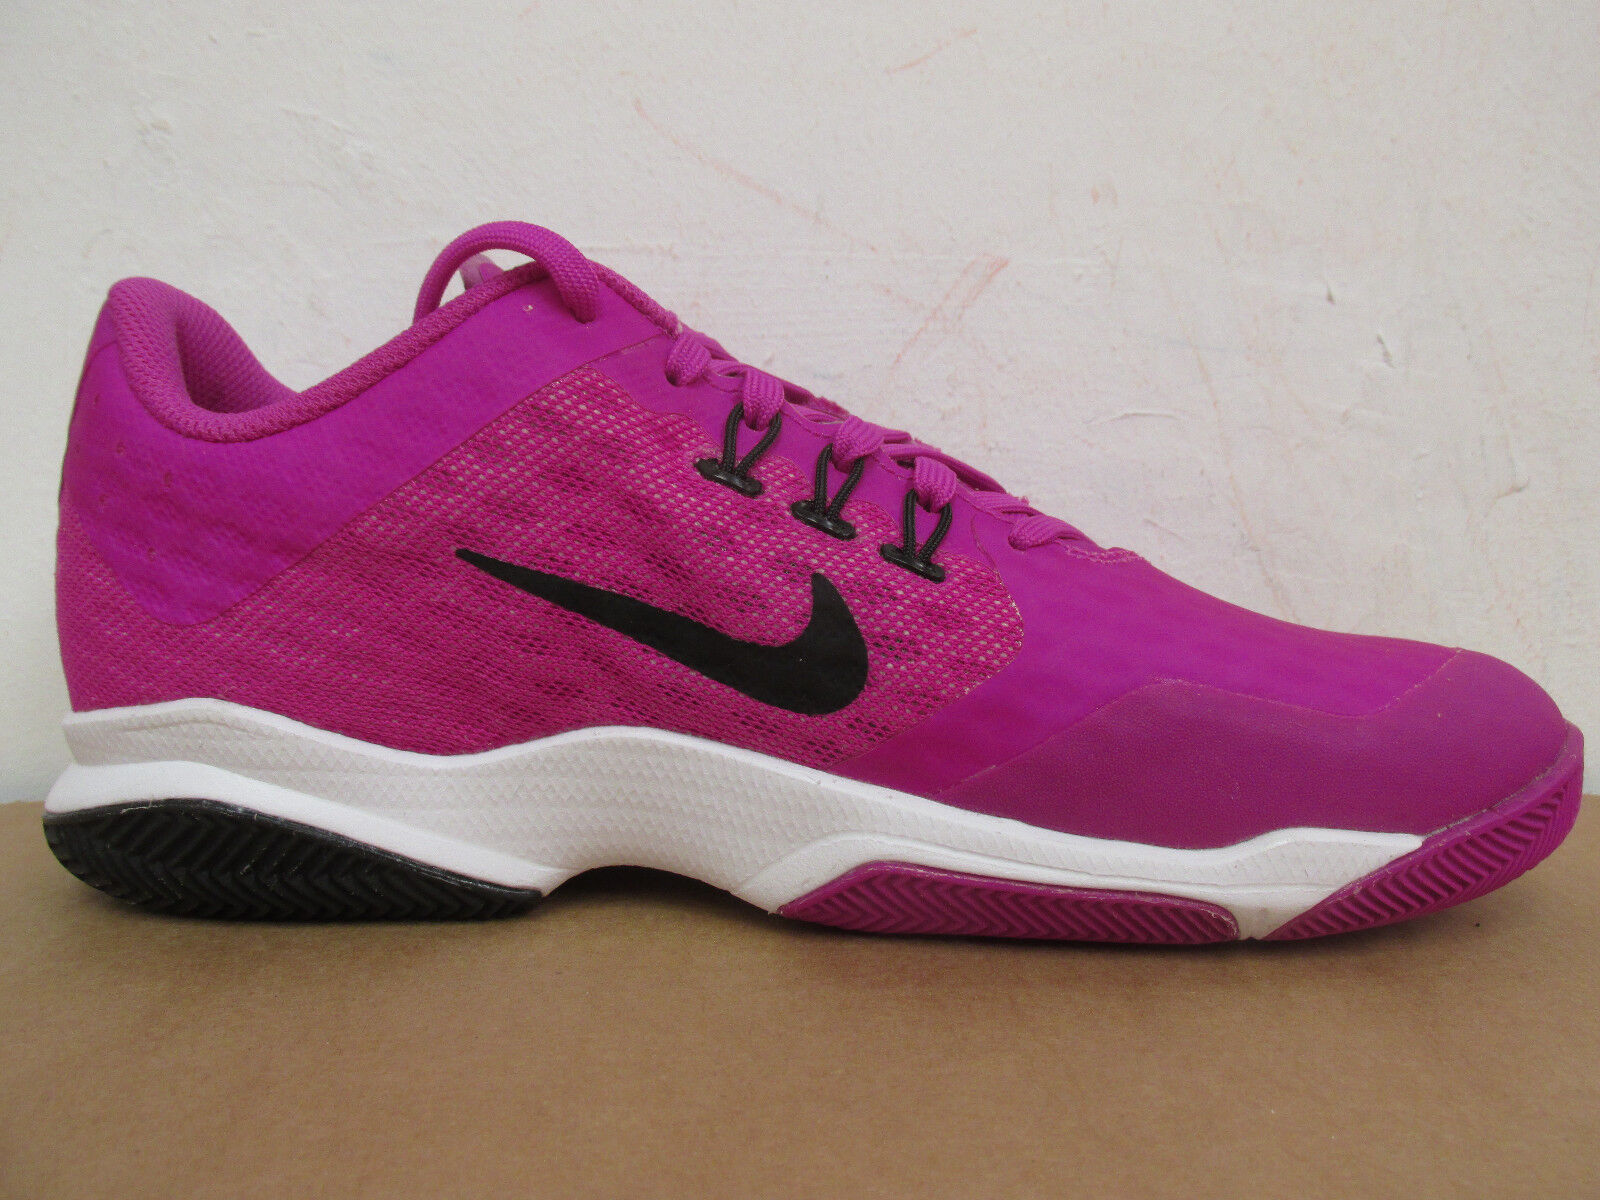 Nike air zoom ultra damen trainers 845046 500 500 500 Turnschuhe schuhe CLEARANCE f149df